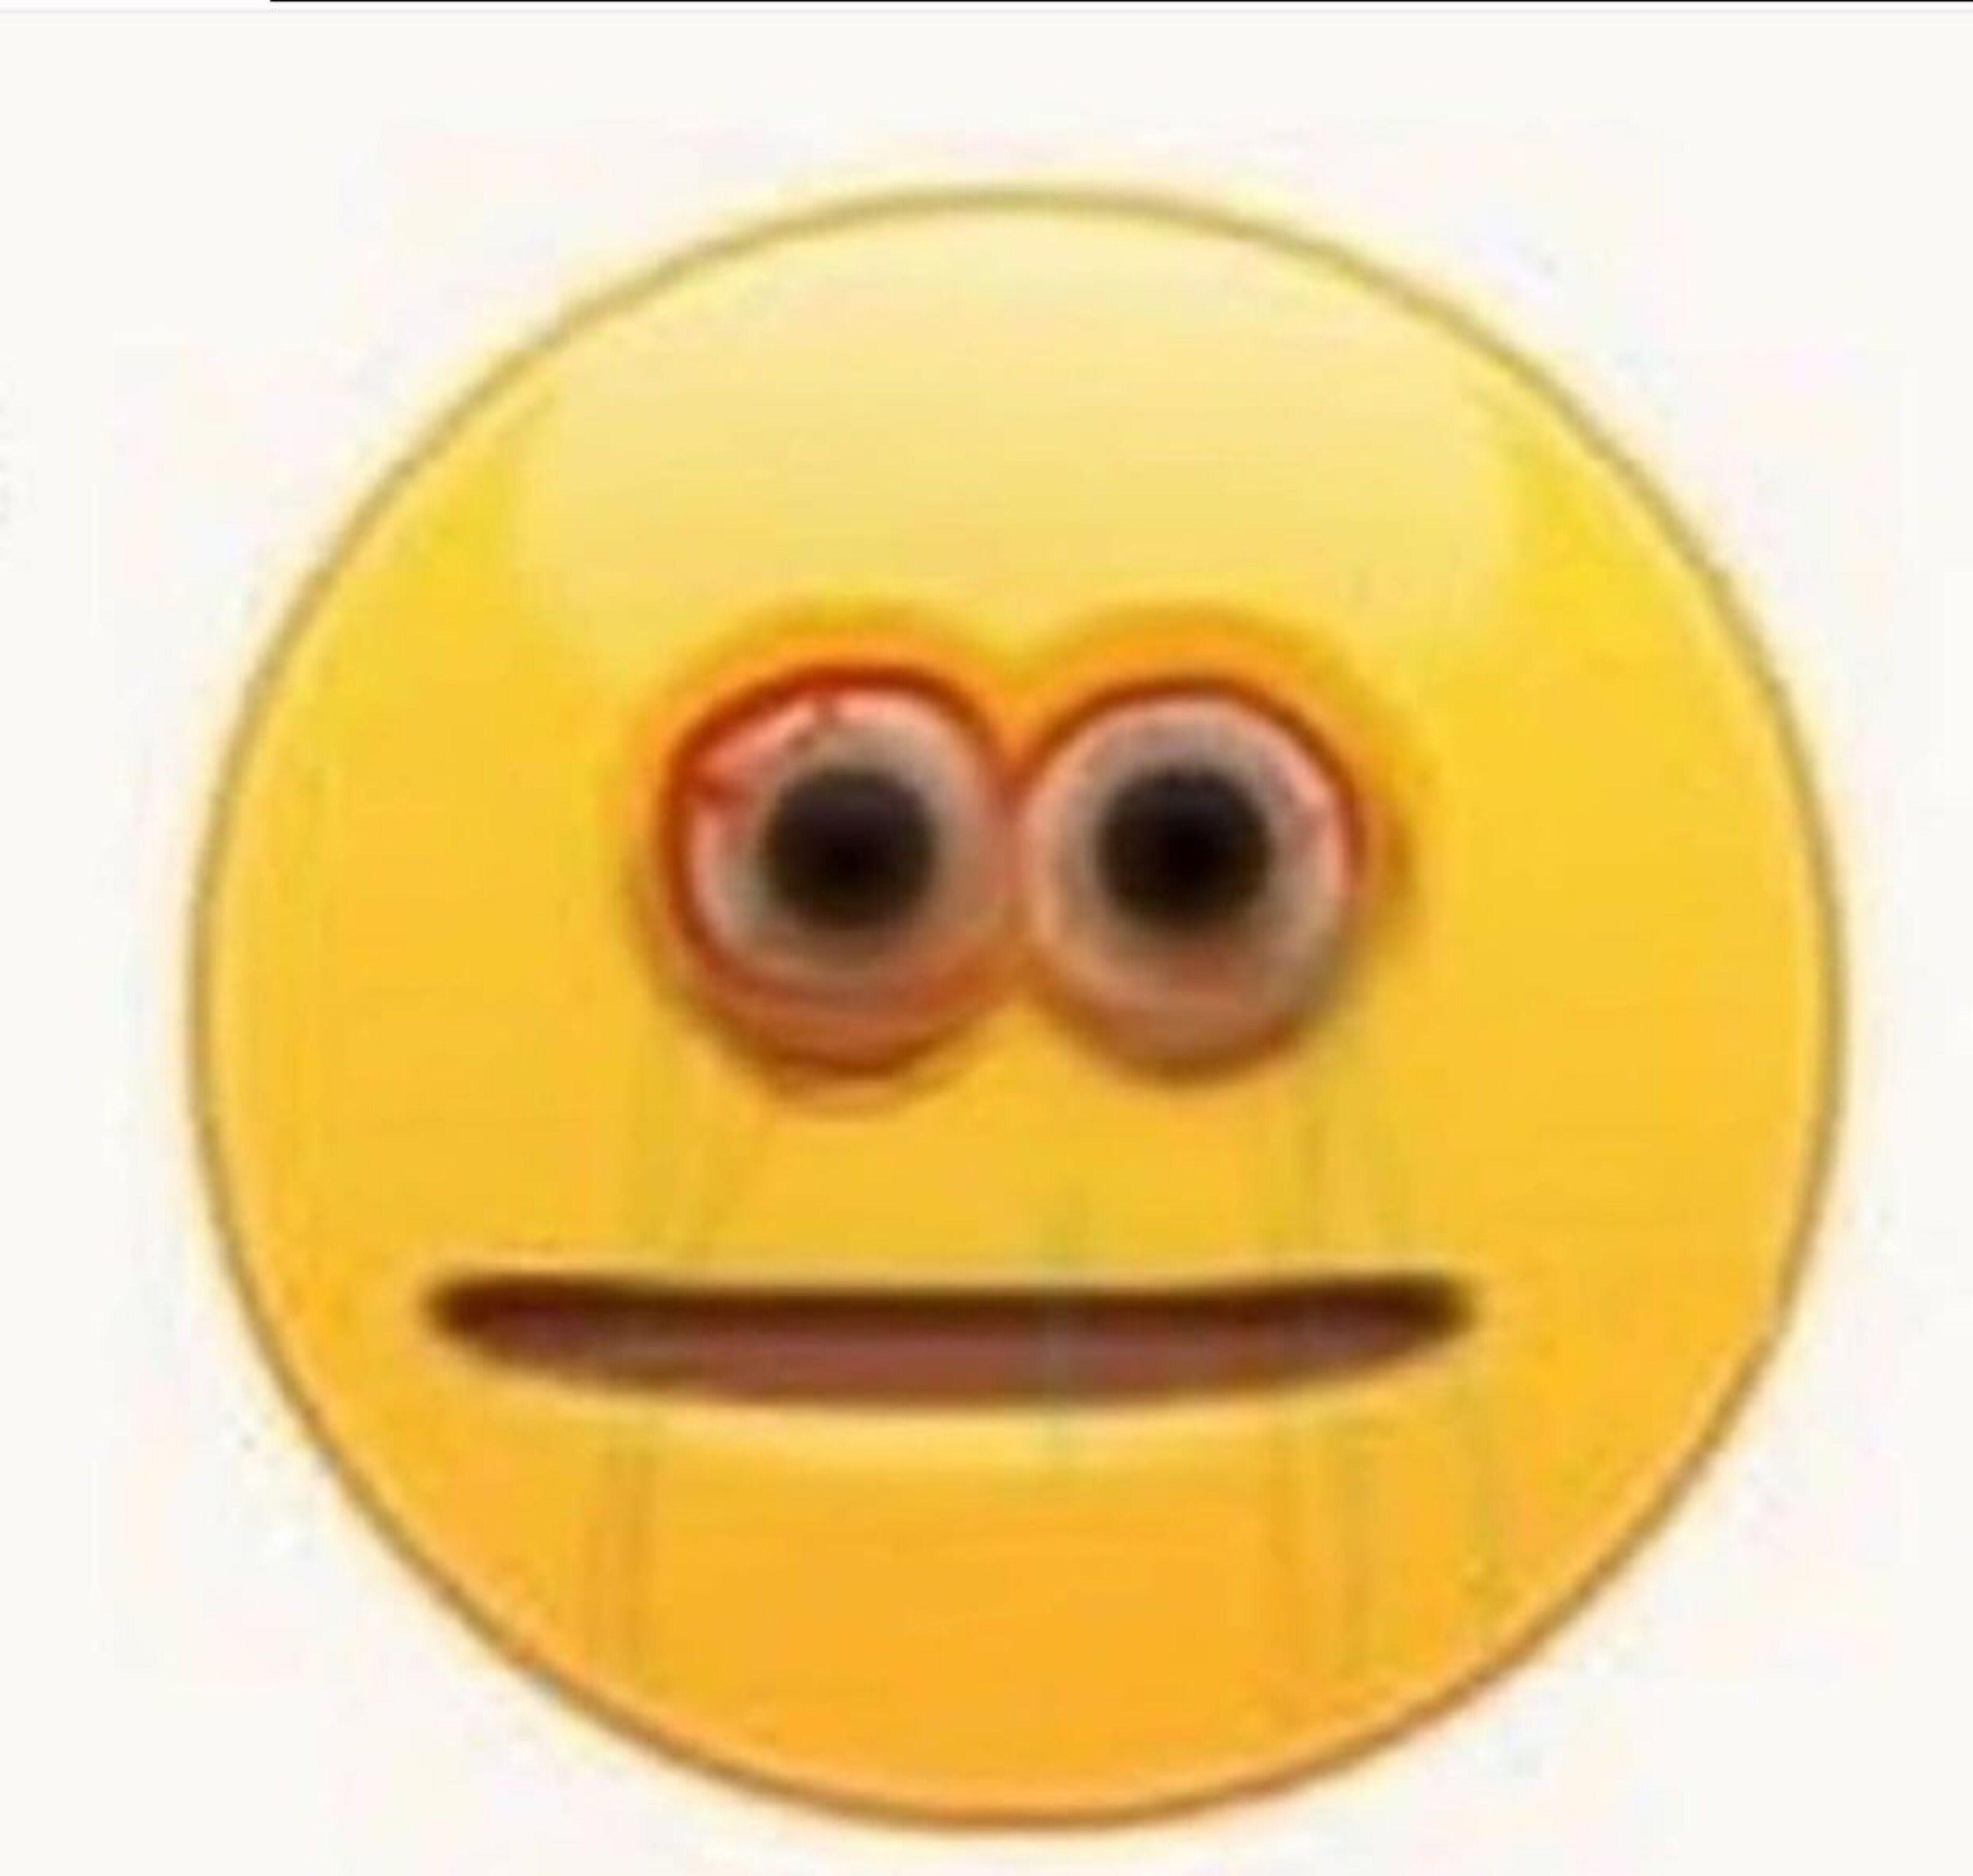 V1rgin M4ry2002ฅ ᐤˊ ฅˋᐤ Emoji Meme Laughing Emoji Meme Template